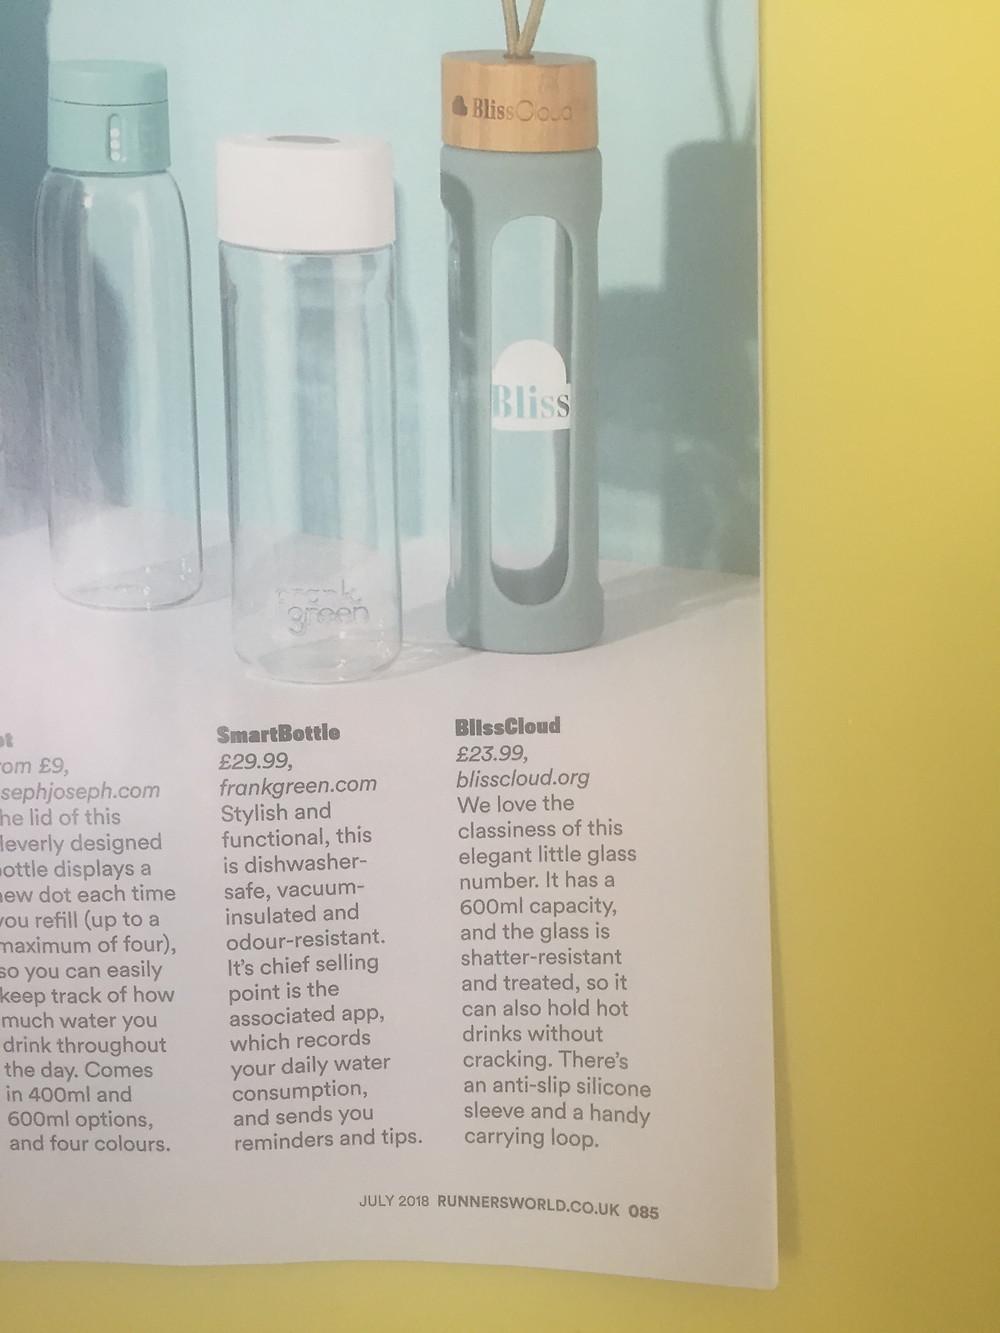 BlissCloud Eco Glass Water Bottle Review in Runner's World July 18 UK Magazine